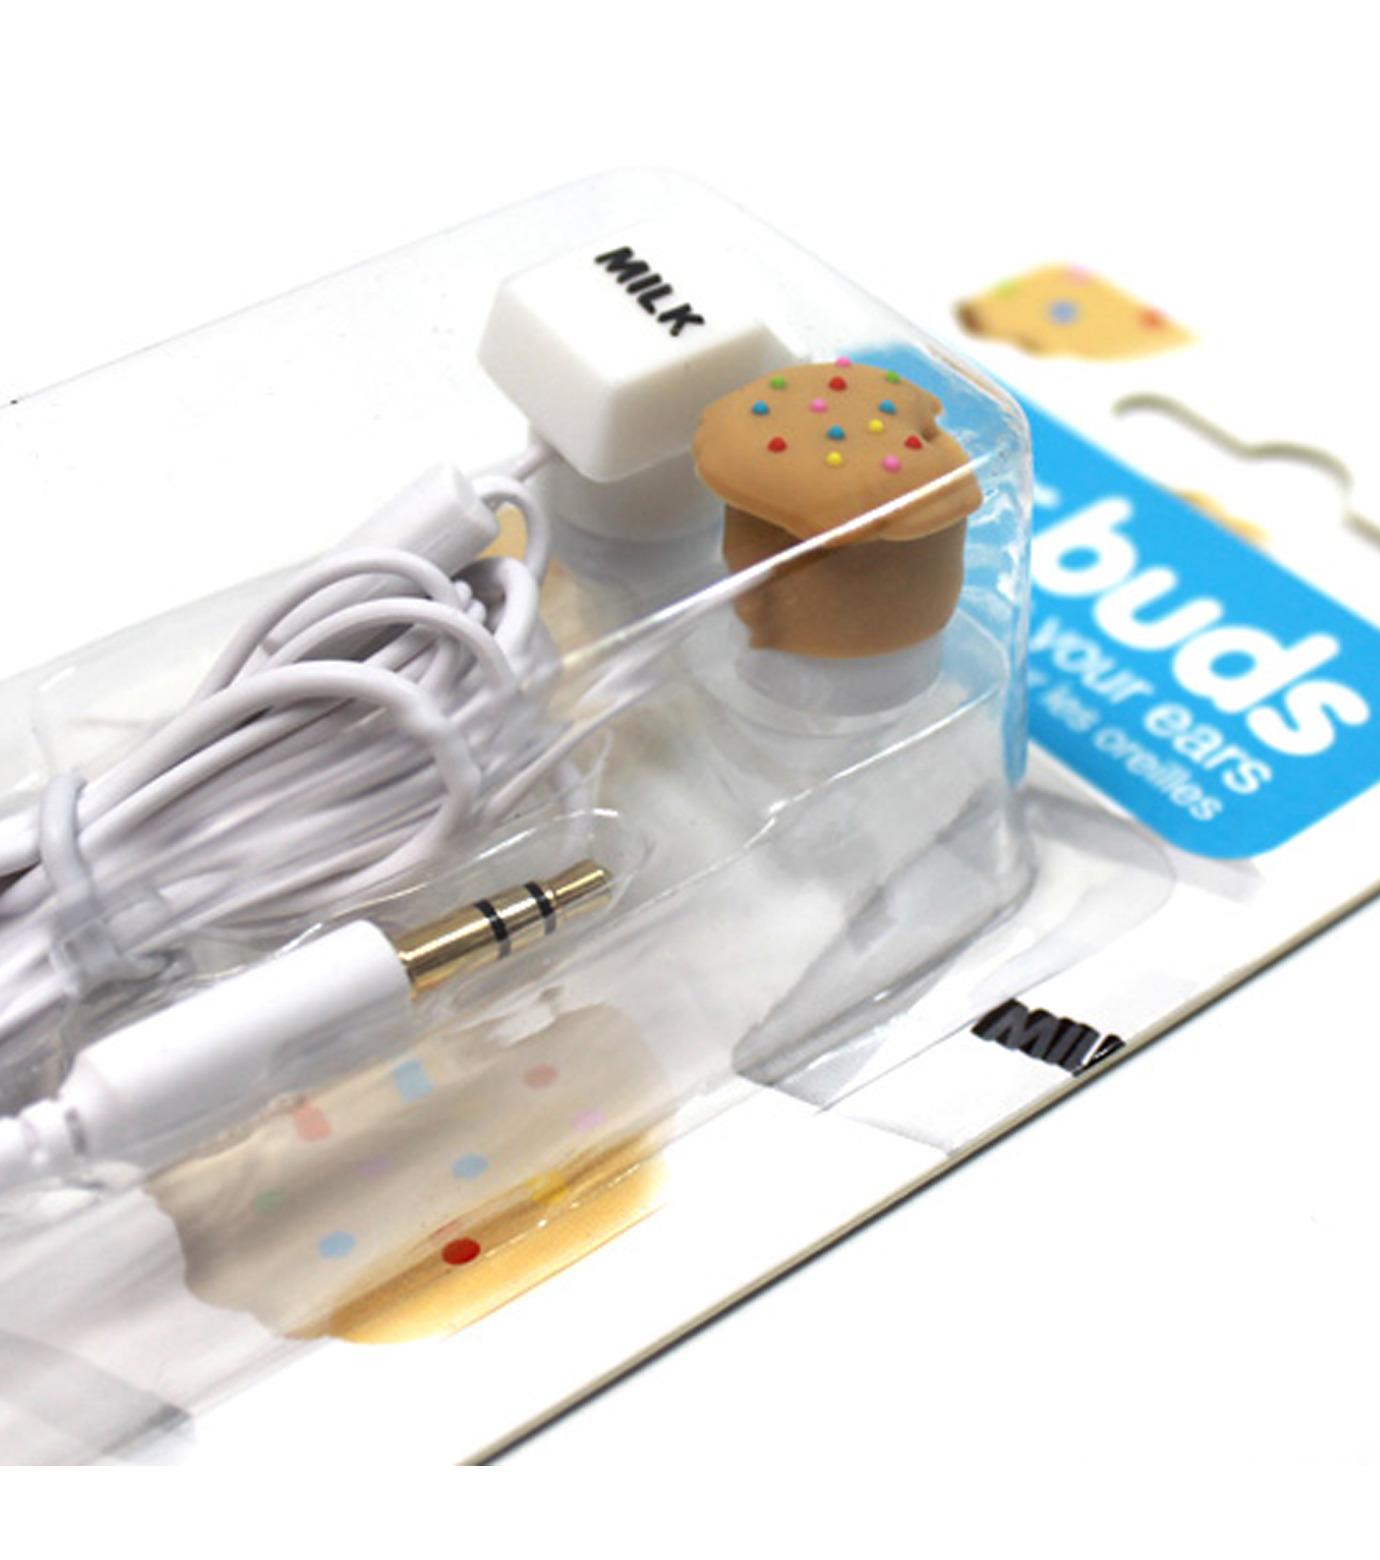 DCI(ディーシーアイ)のEarbuds Milk & Cookies-MULTI COLOUR(アザーズ/EARPHONE/others/EARPHONE)-38129-9 拡大詳細画像3